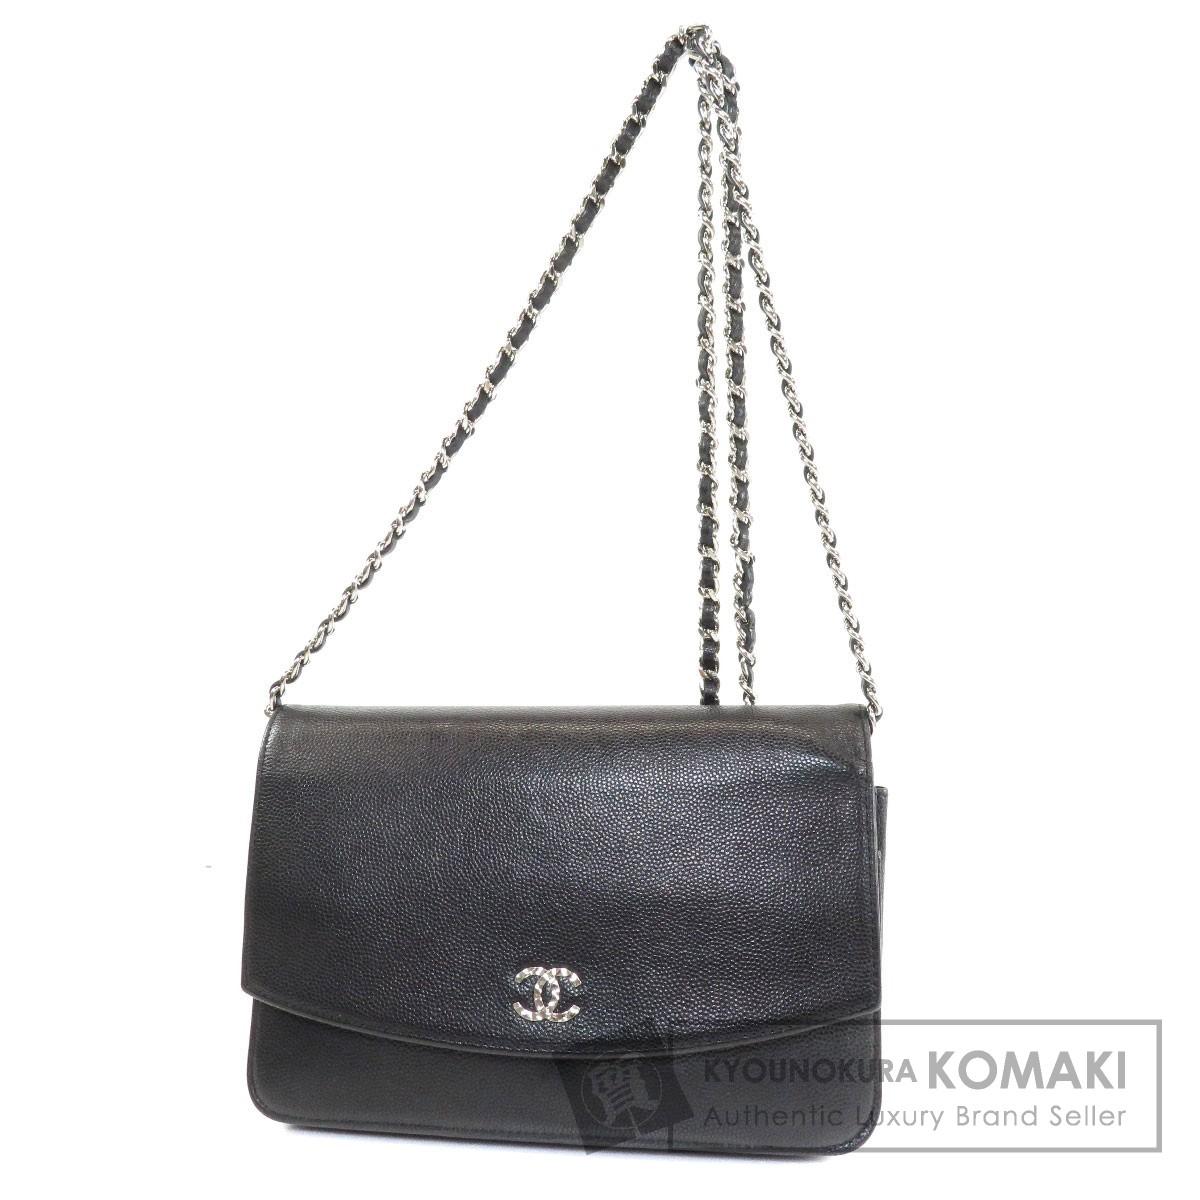 48a8f6d093 Kyonokura Komaki Brand Cheapest Challenger: Authentic CHANEL Chain ...